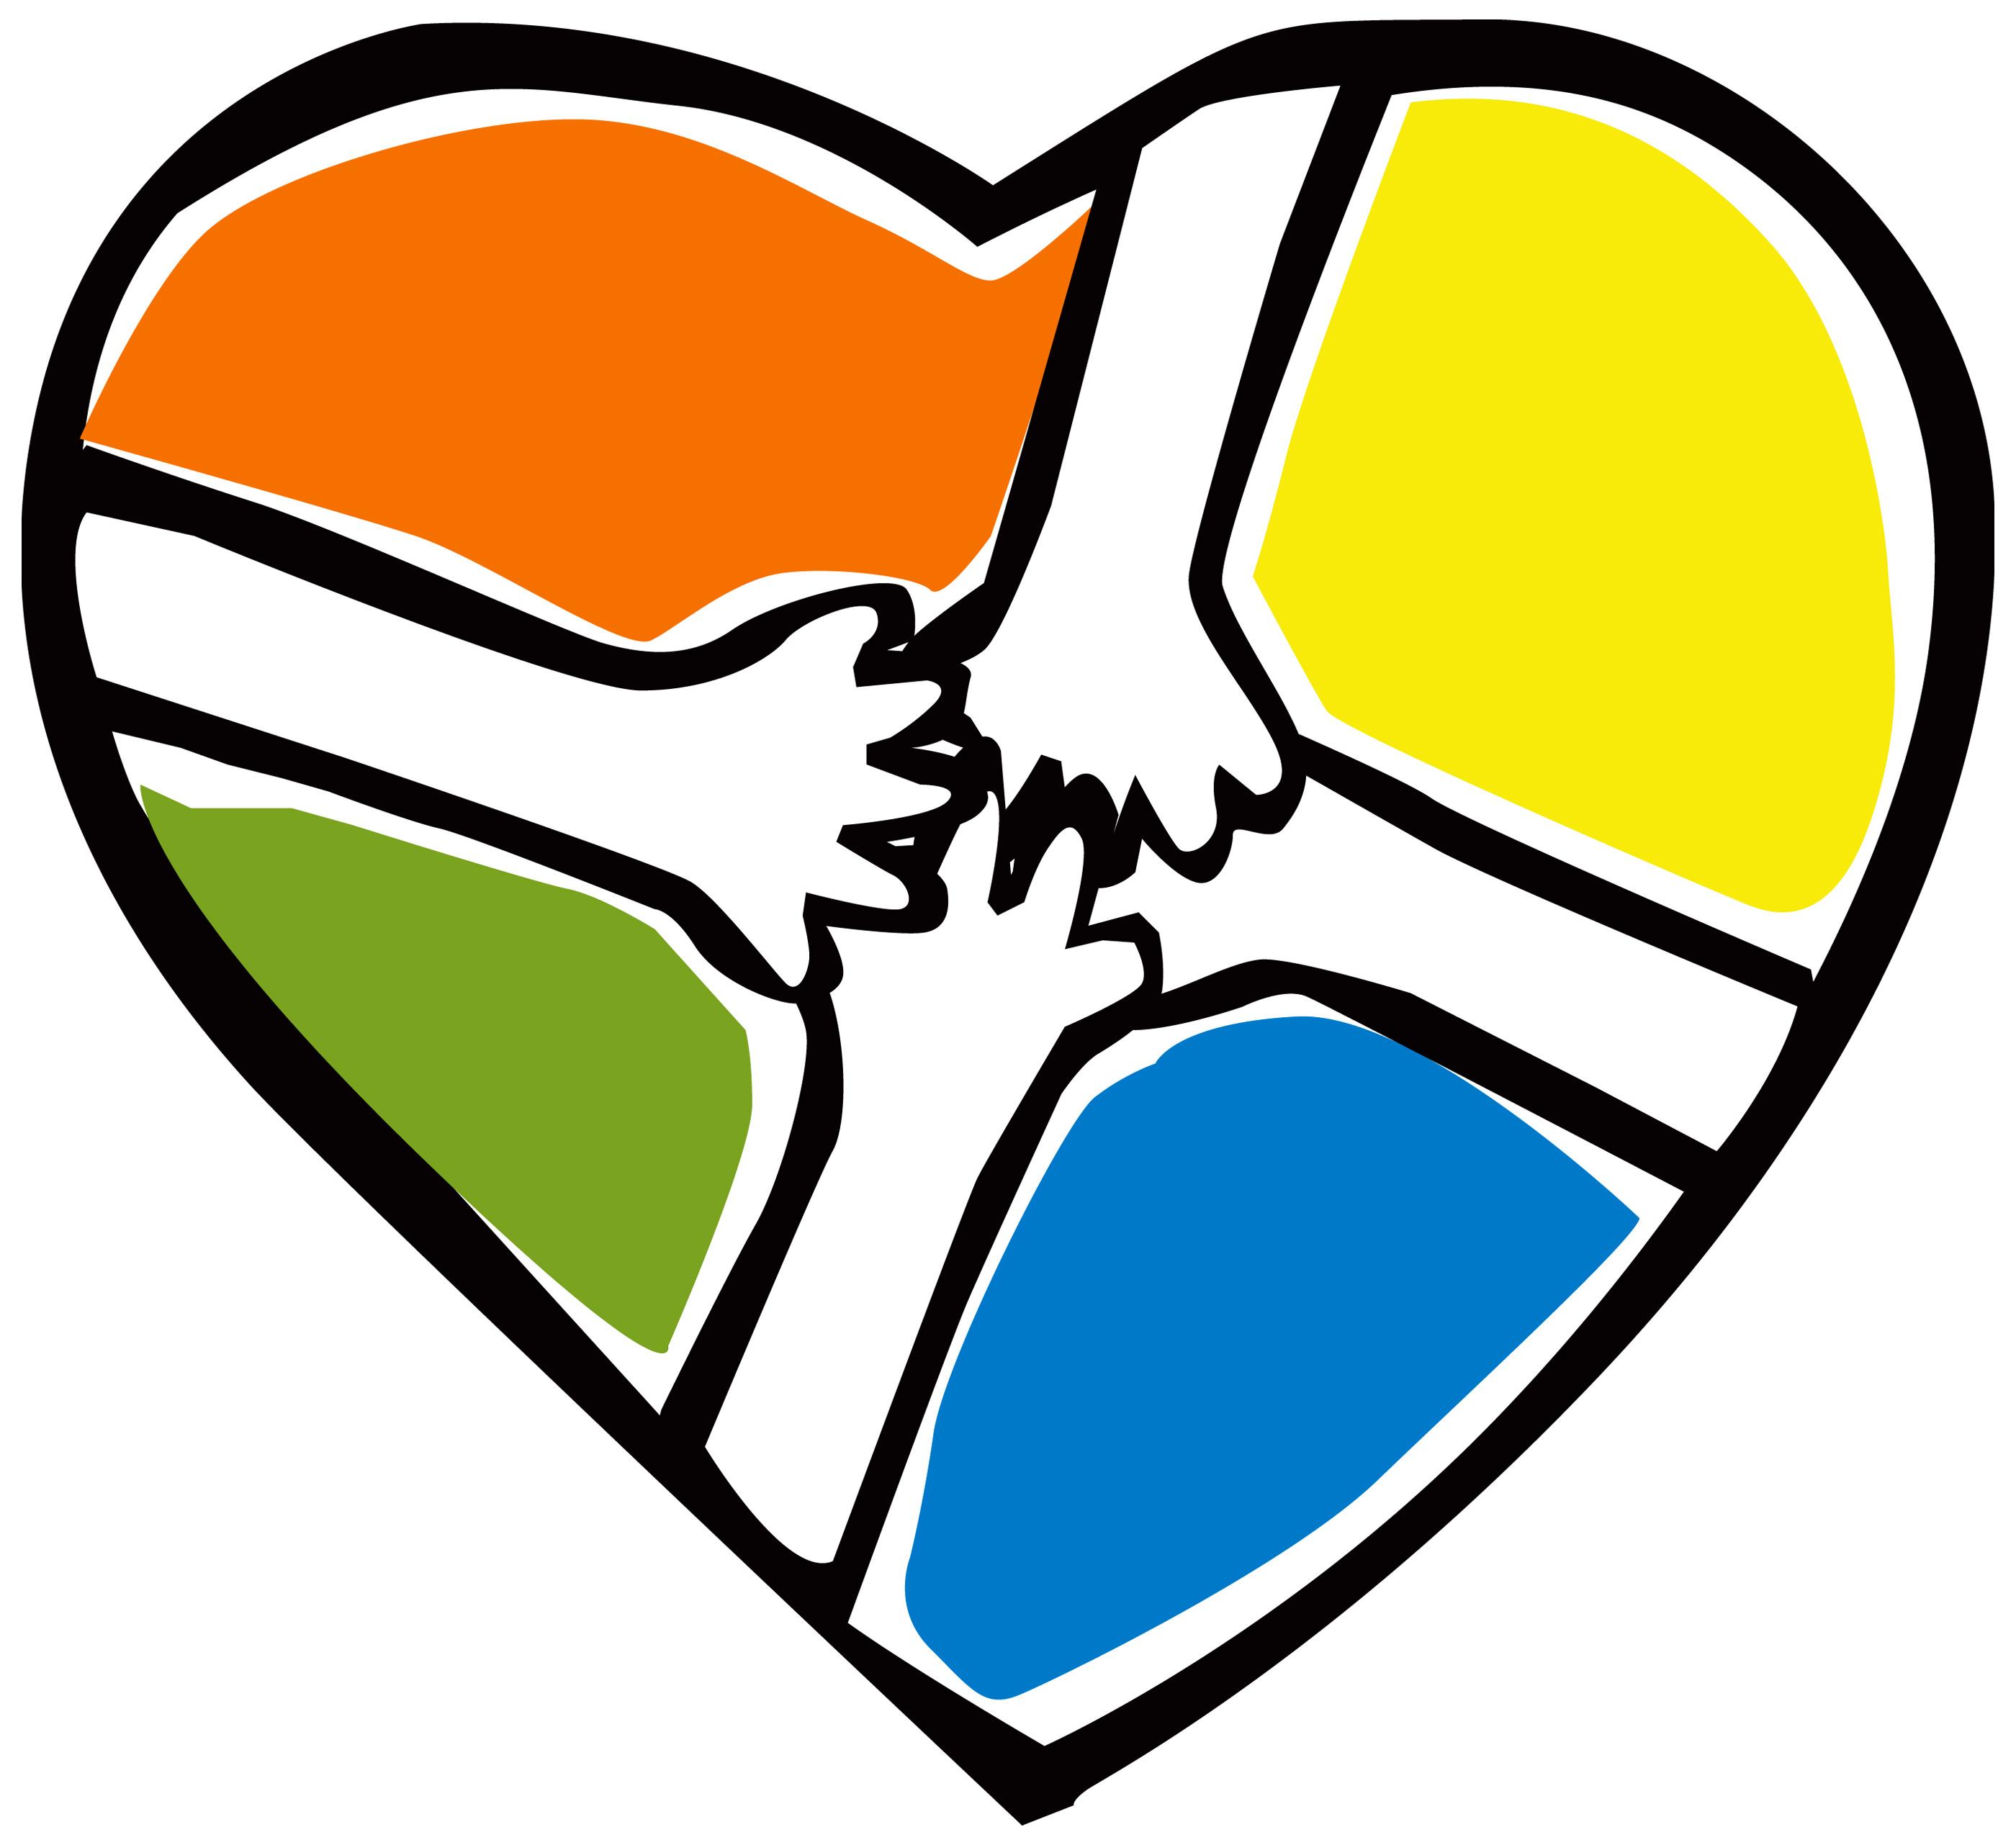 Caring clipart spiritual care. Help clip art free